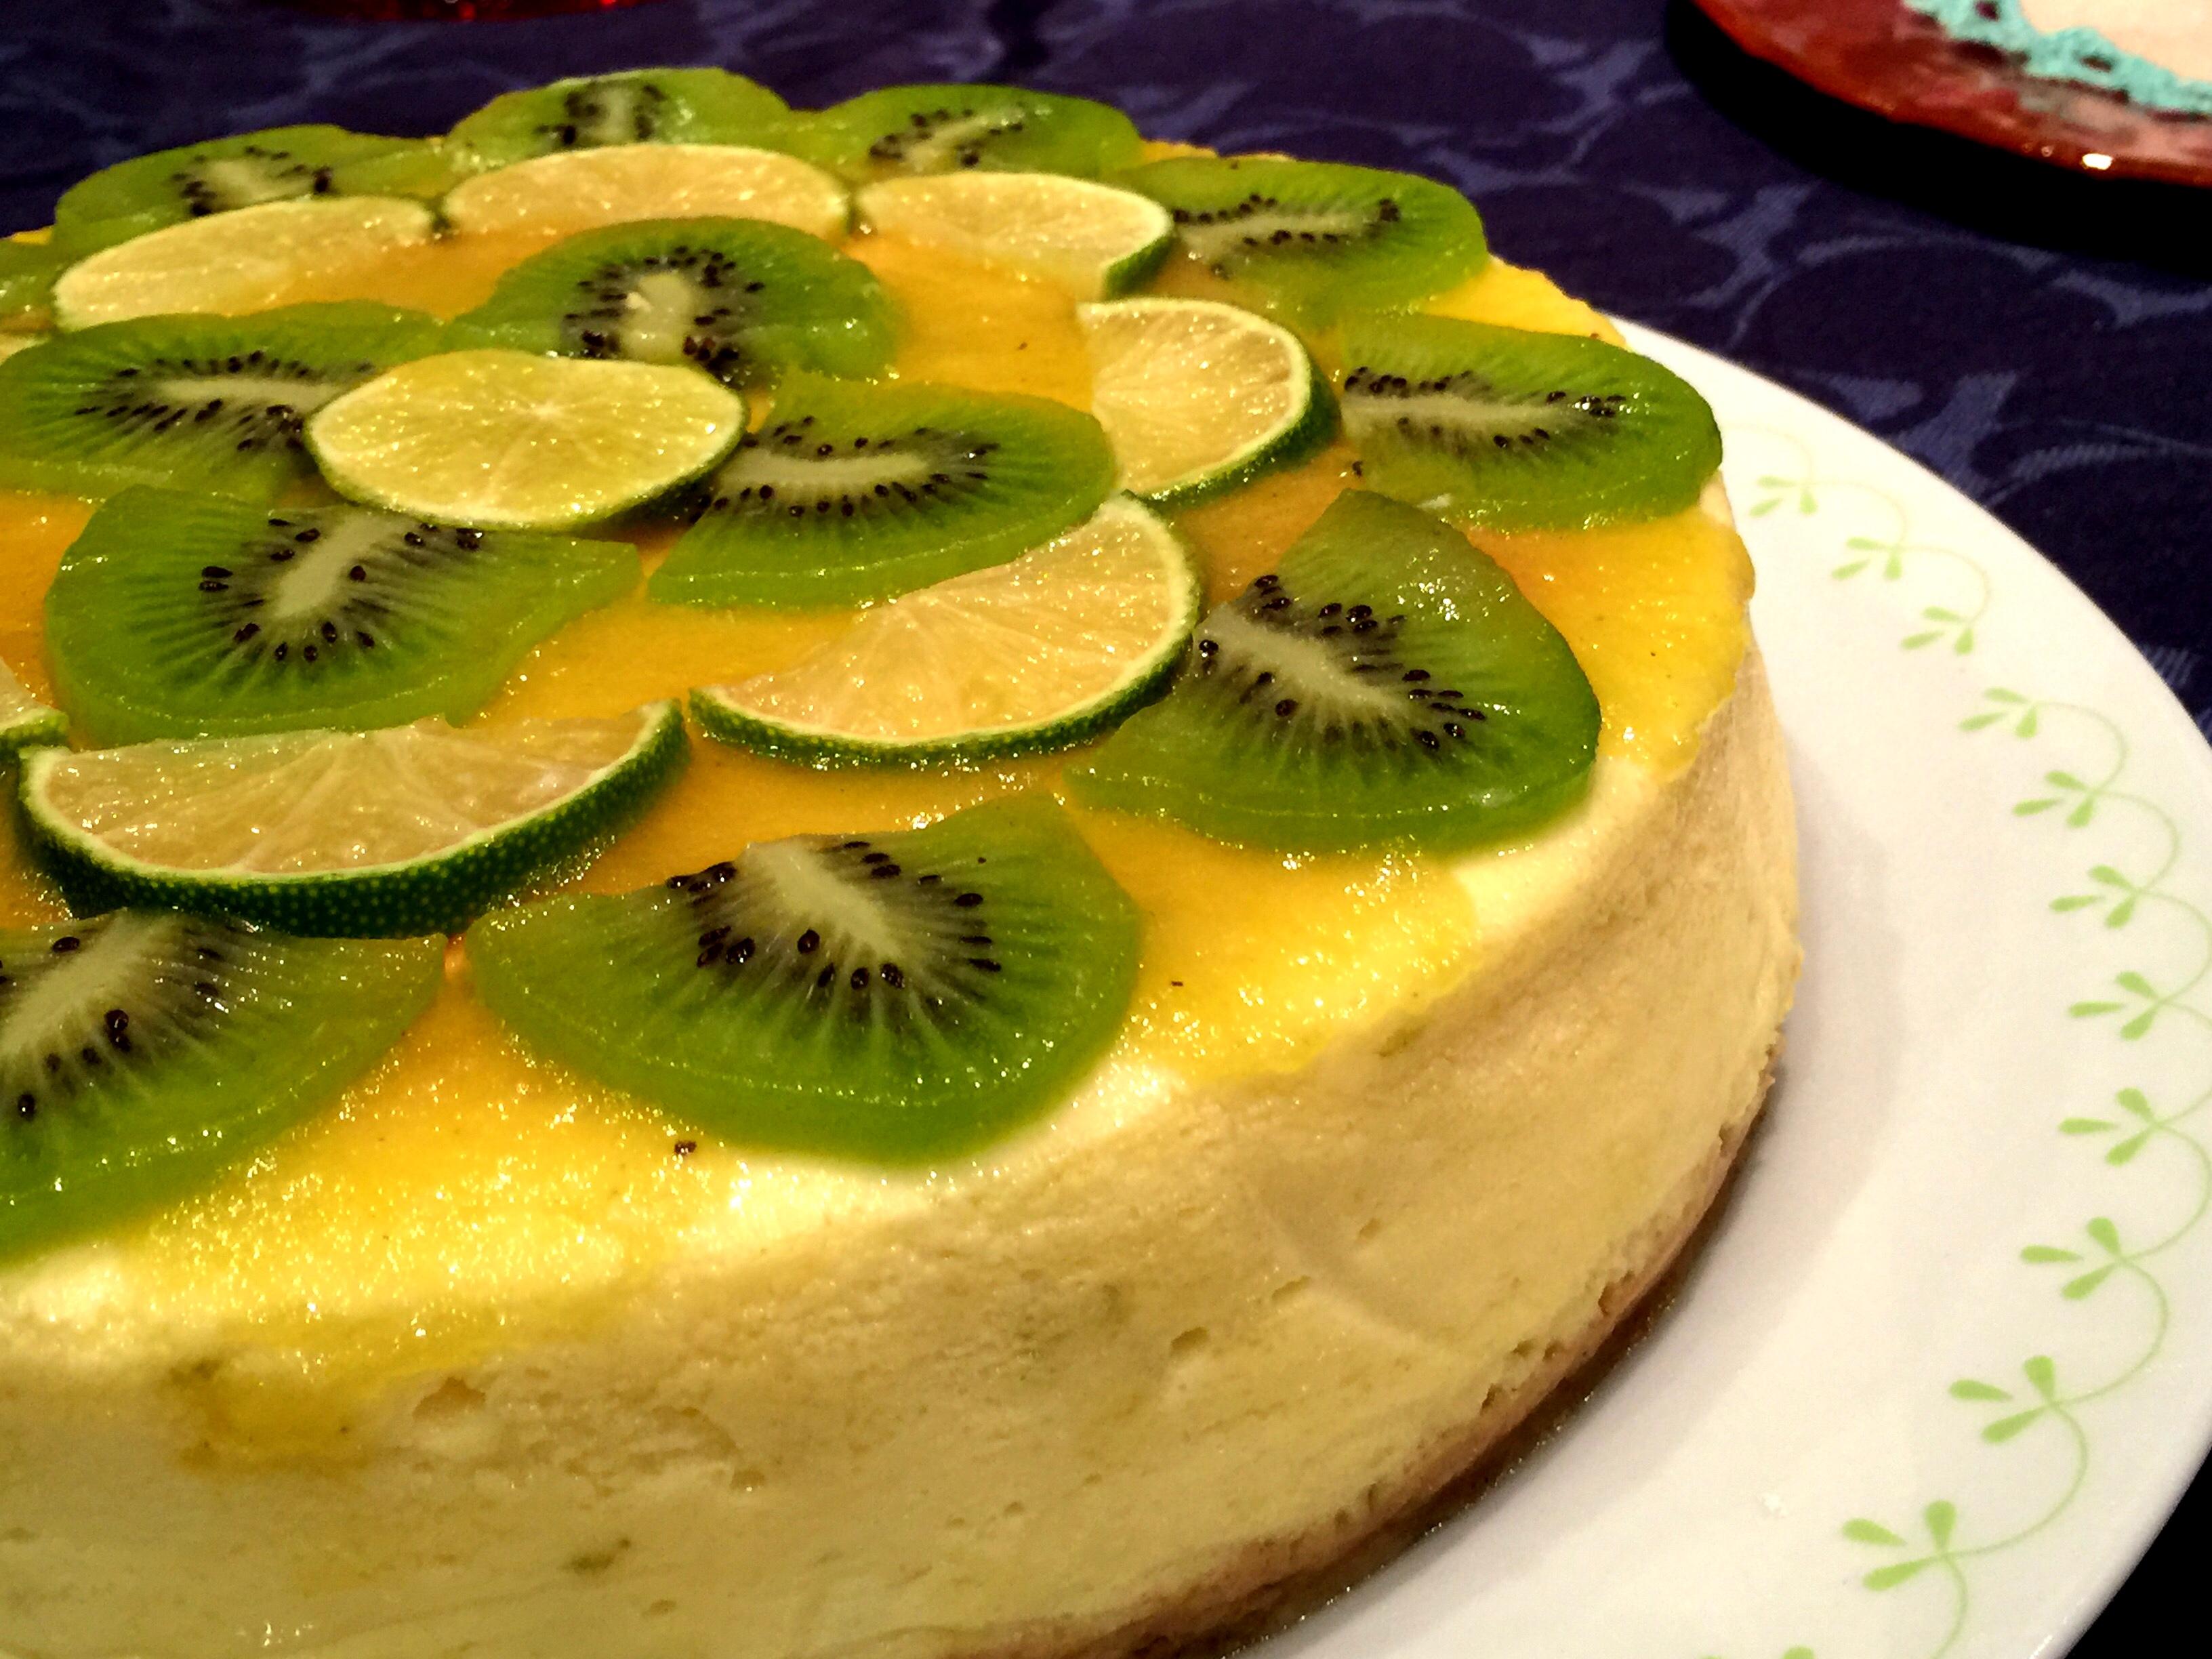 Cheesecake con kiwi e lime